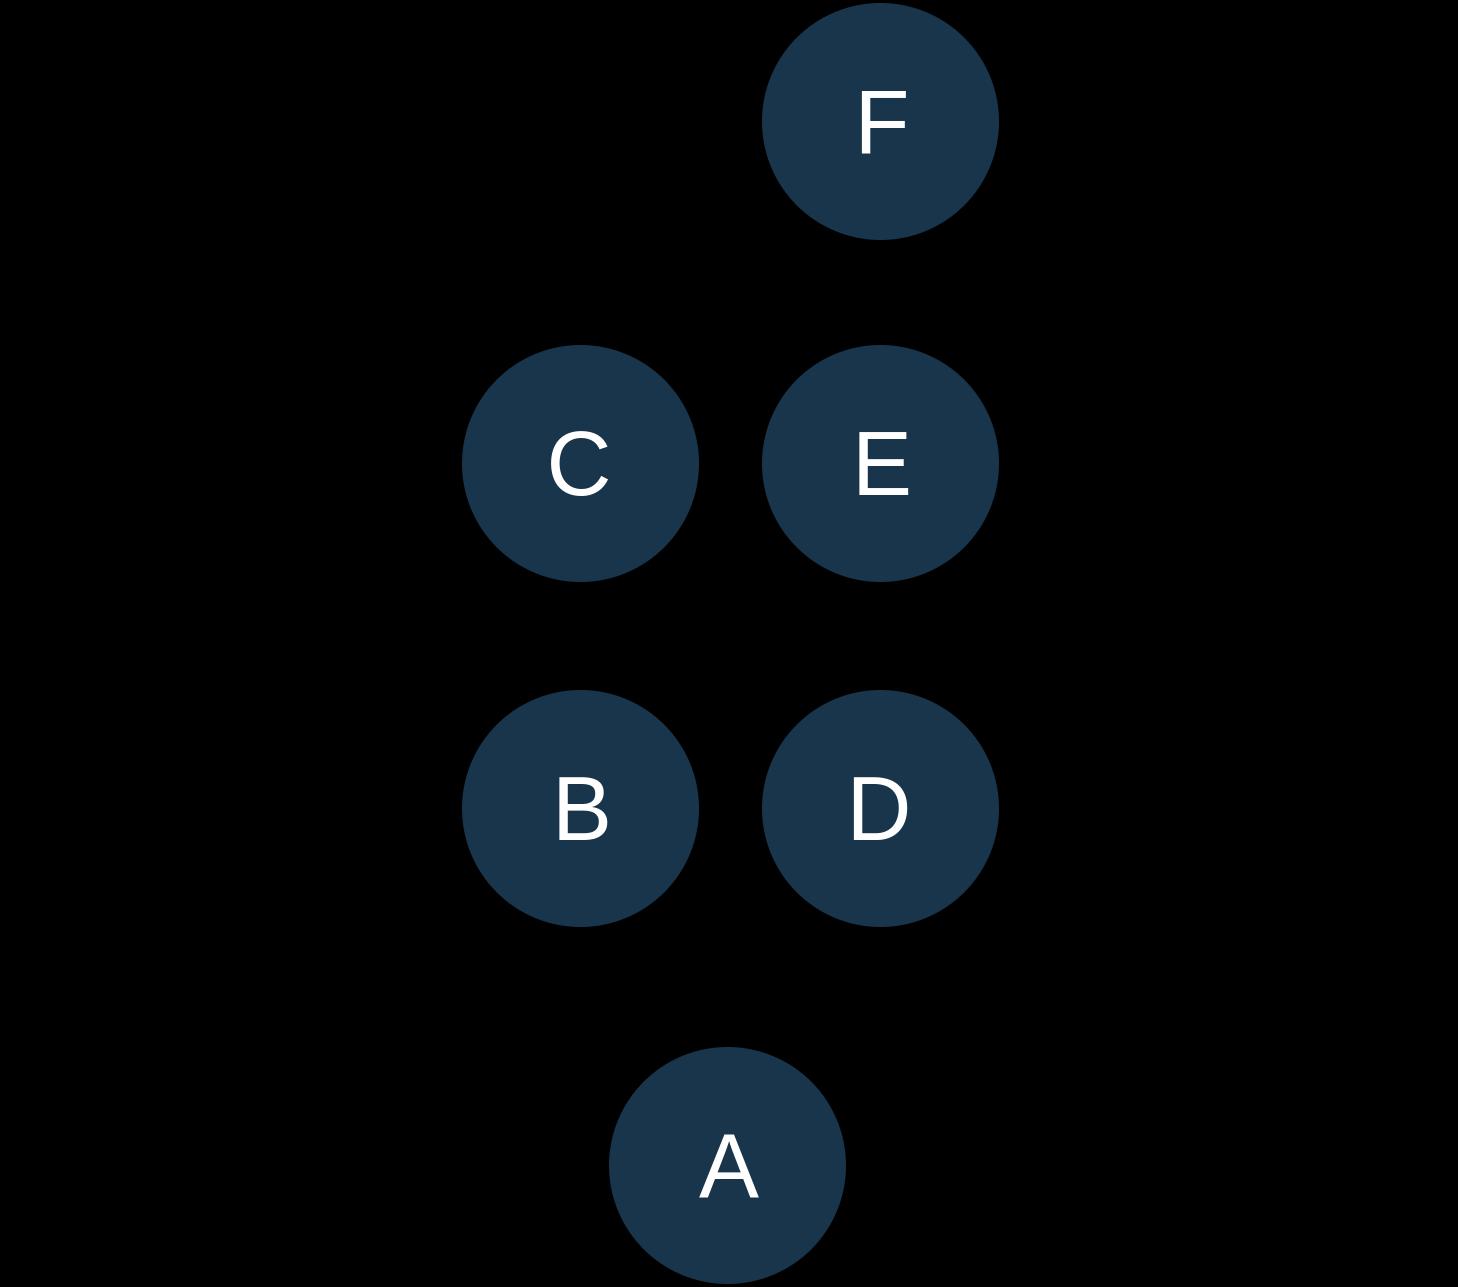 Branch1-A->B->C, Branch2 A->D->E->F